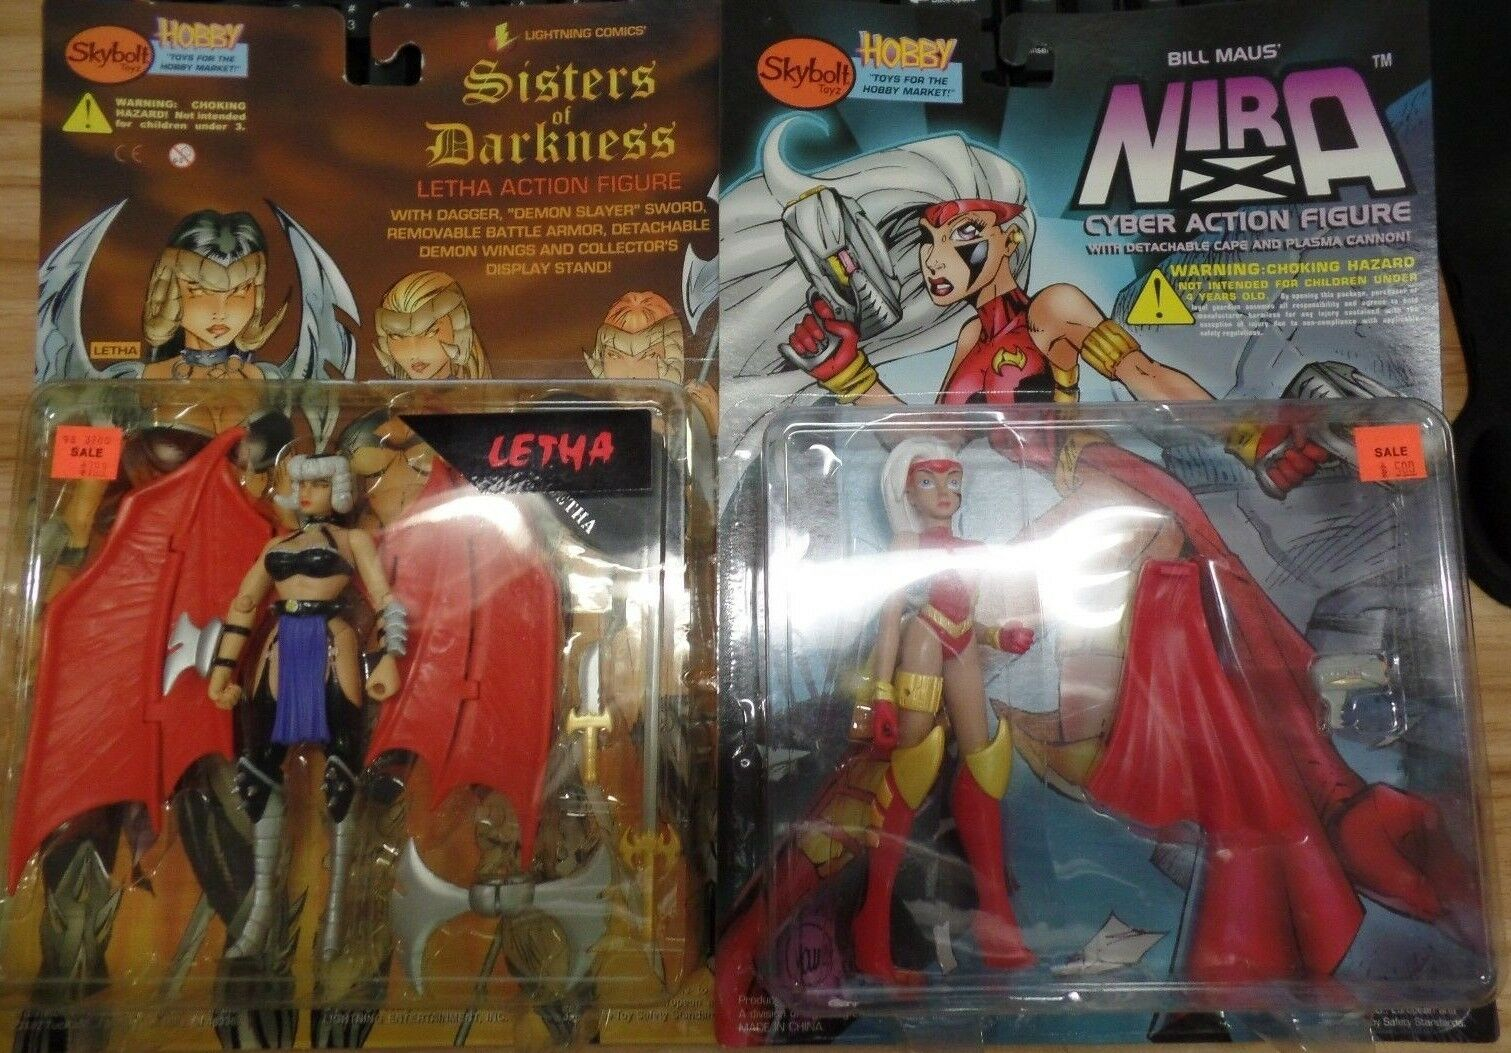 Skybolt Skybolt Skybolt Figure Lot of 2 Bill Maus Nira & Sisters of Destruction Letha 071918DBT4 a9b1b1